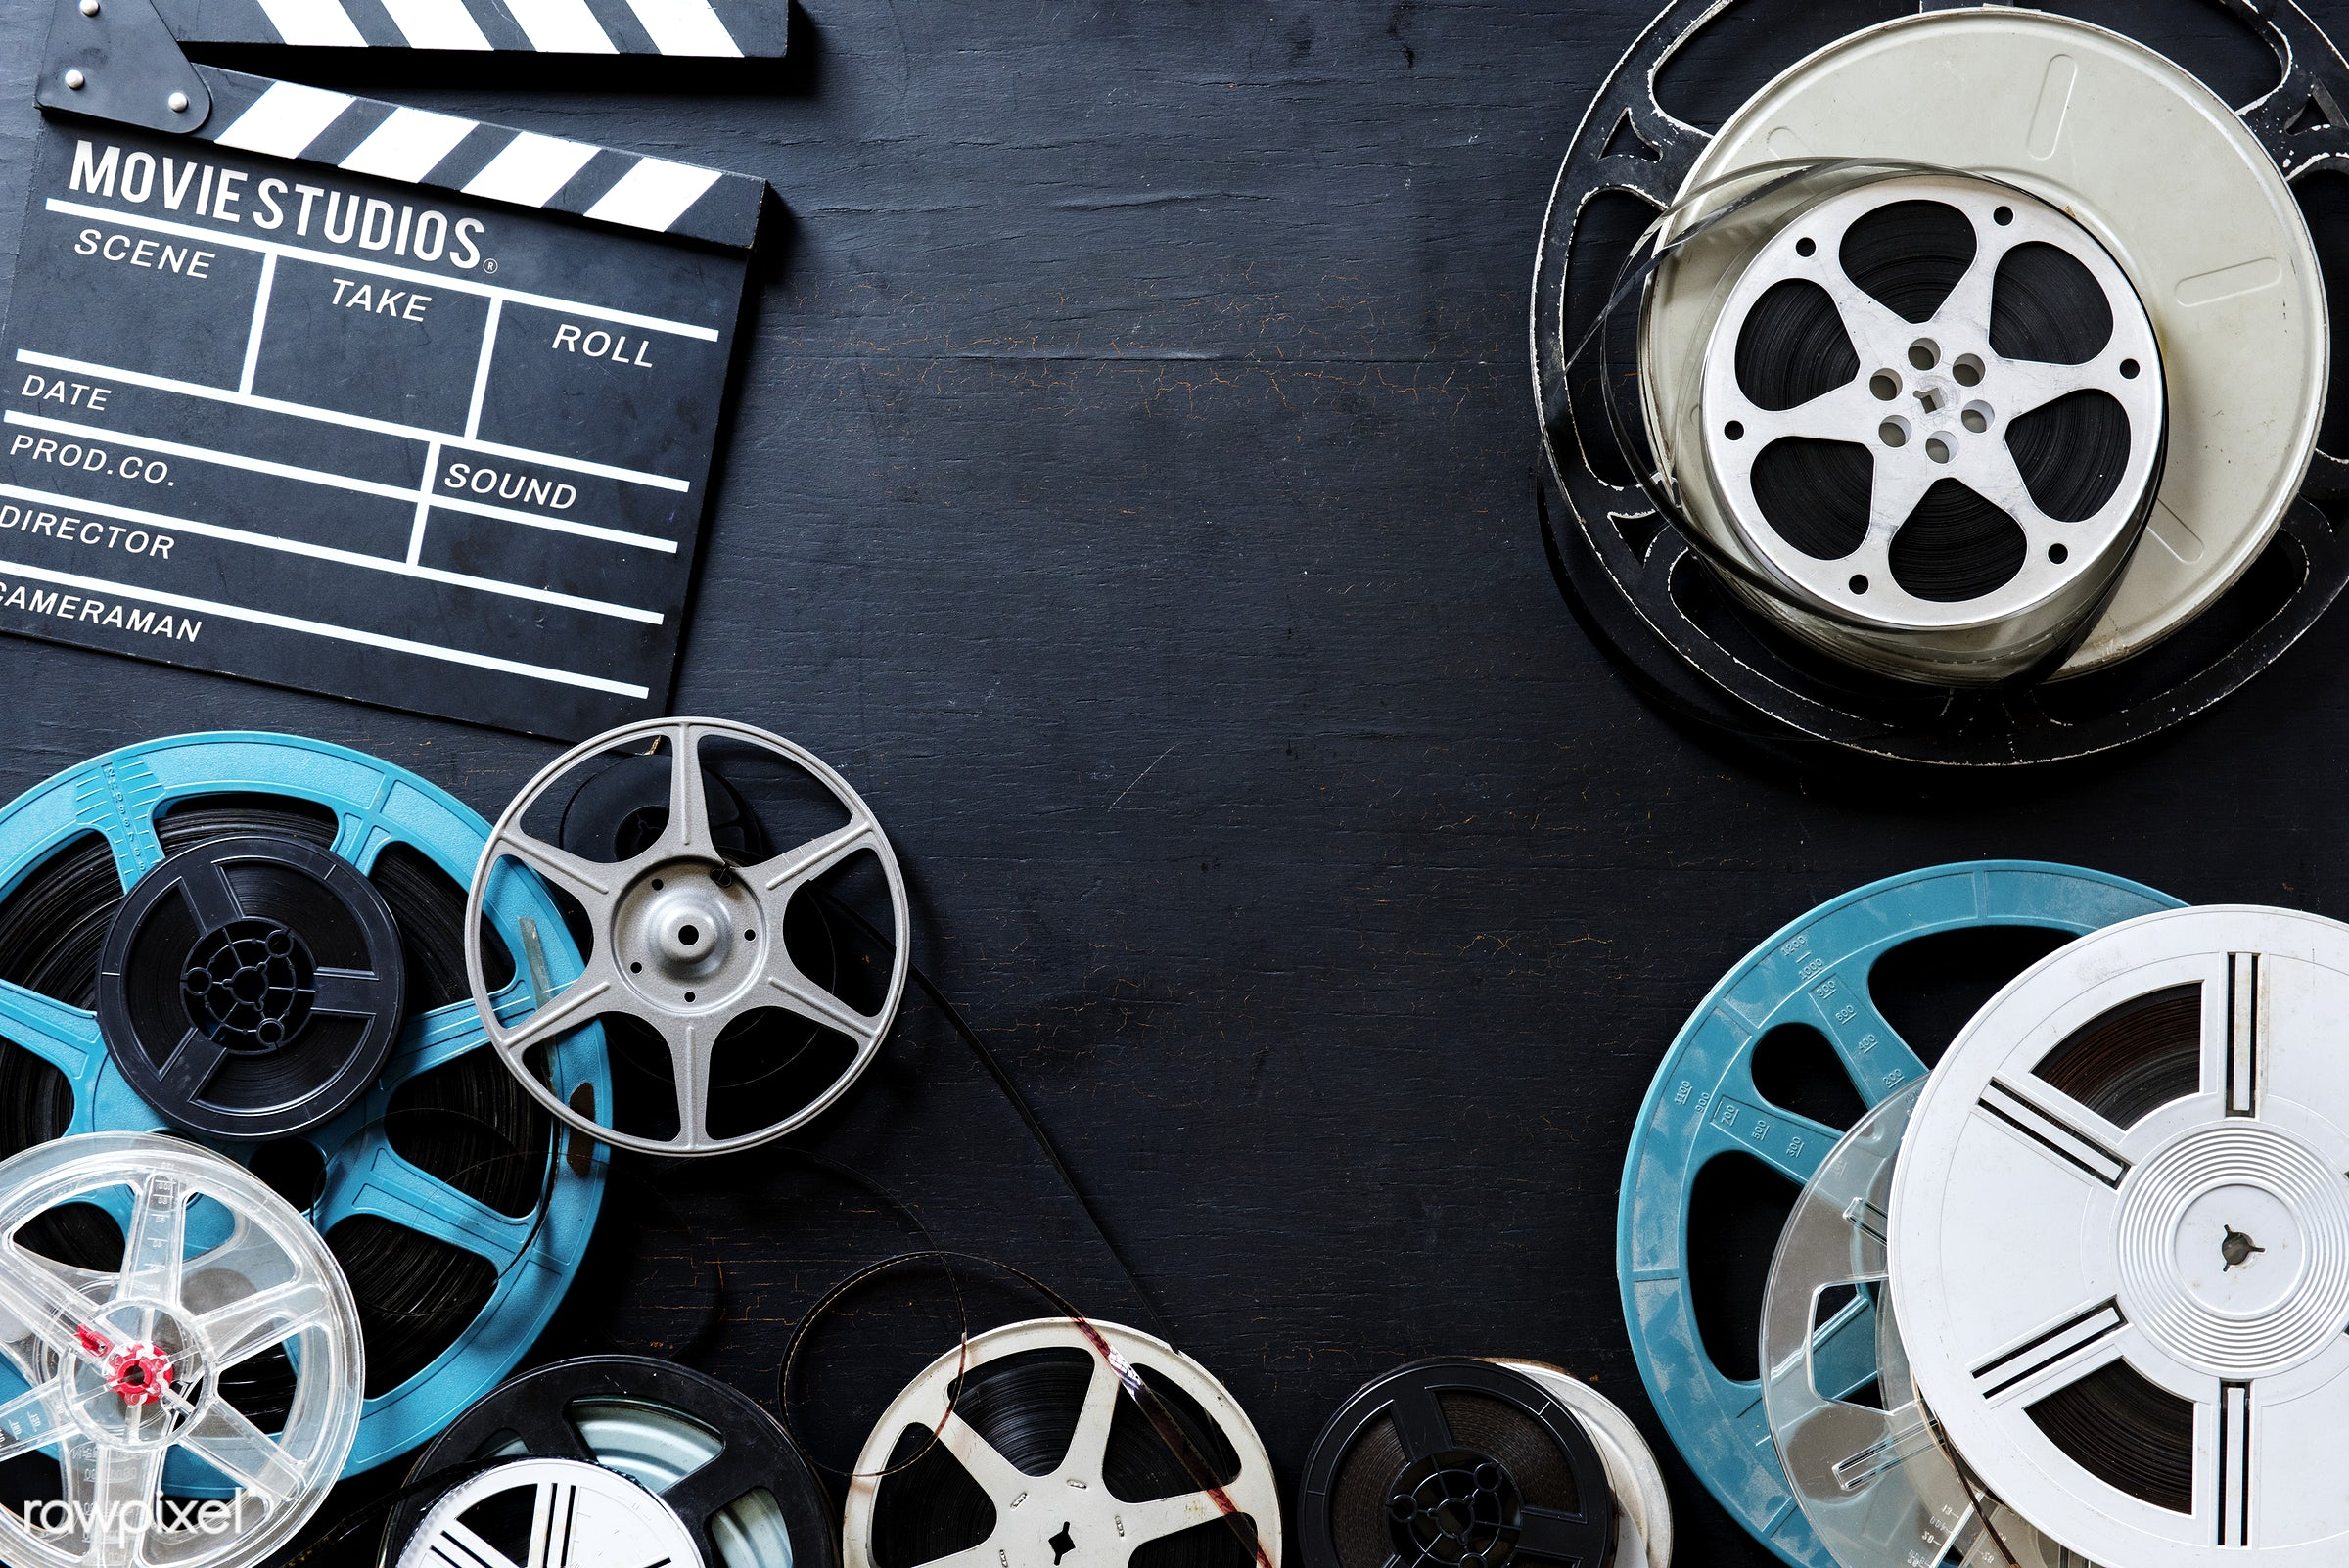 Retro video film rolls - action, analog, antique, cinema, entertainment, equipment, film, film strip, industry, movie, old,...